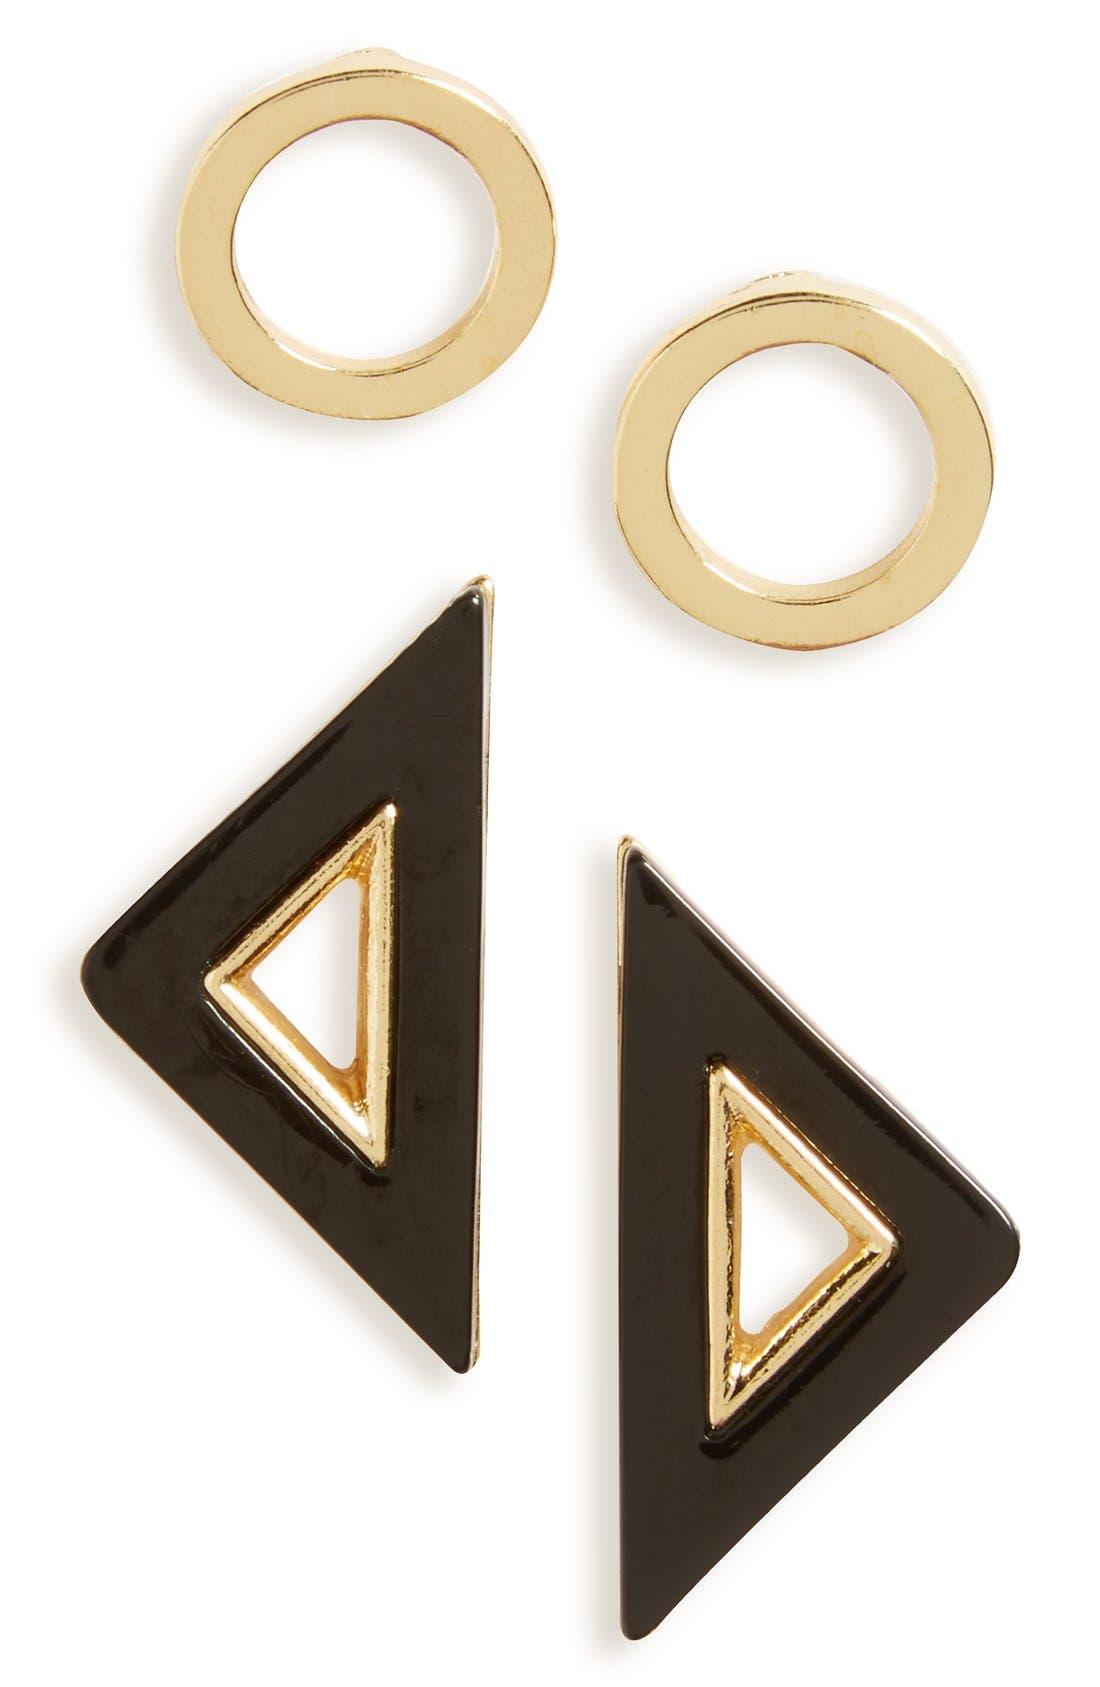 Alternate Image 1 Selected - Topshop Circle & Triangle Stud Earrings (Set of 2)